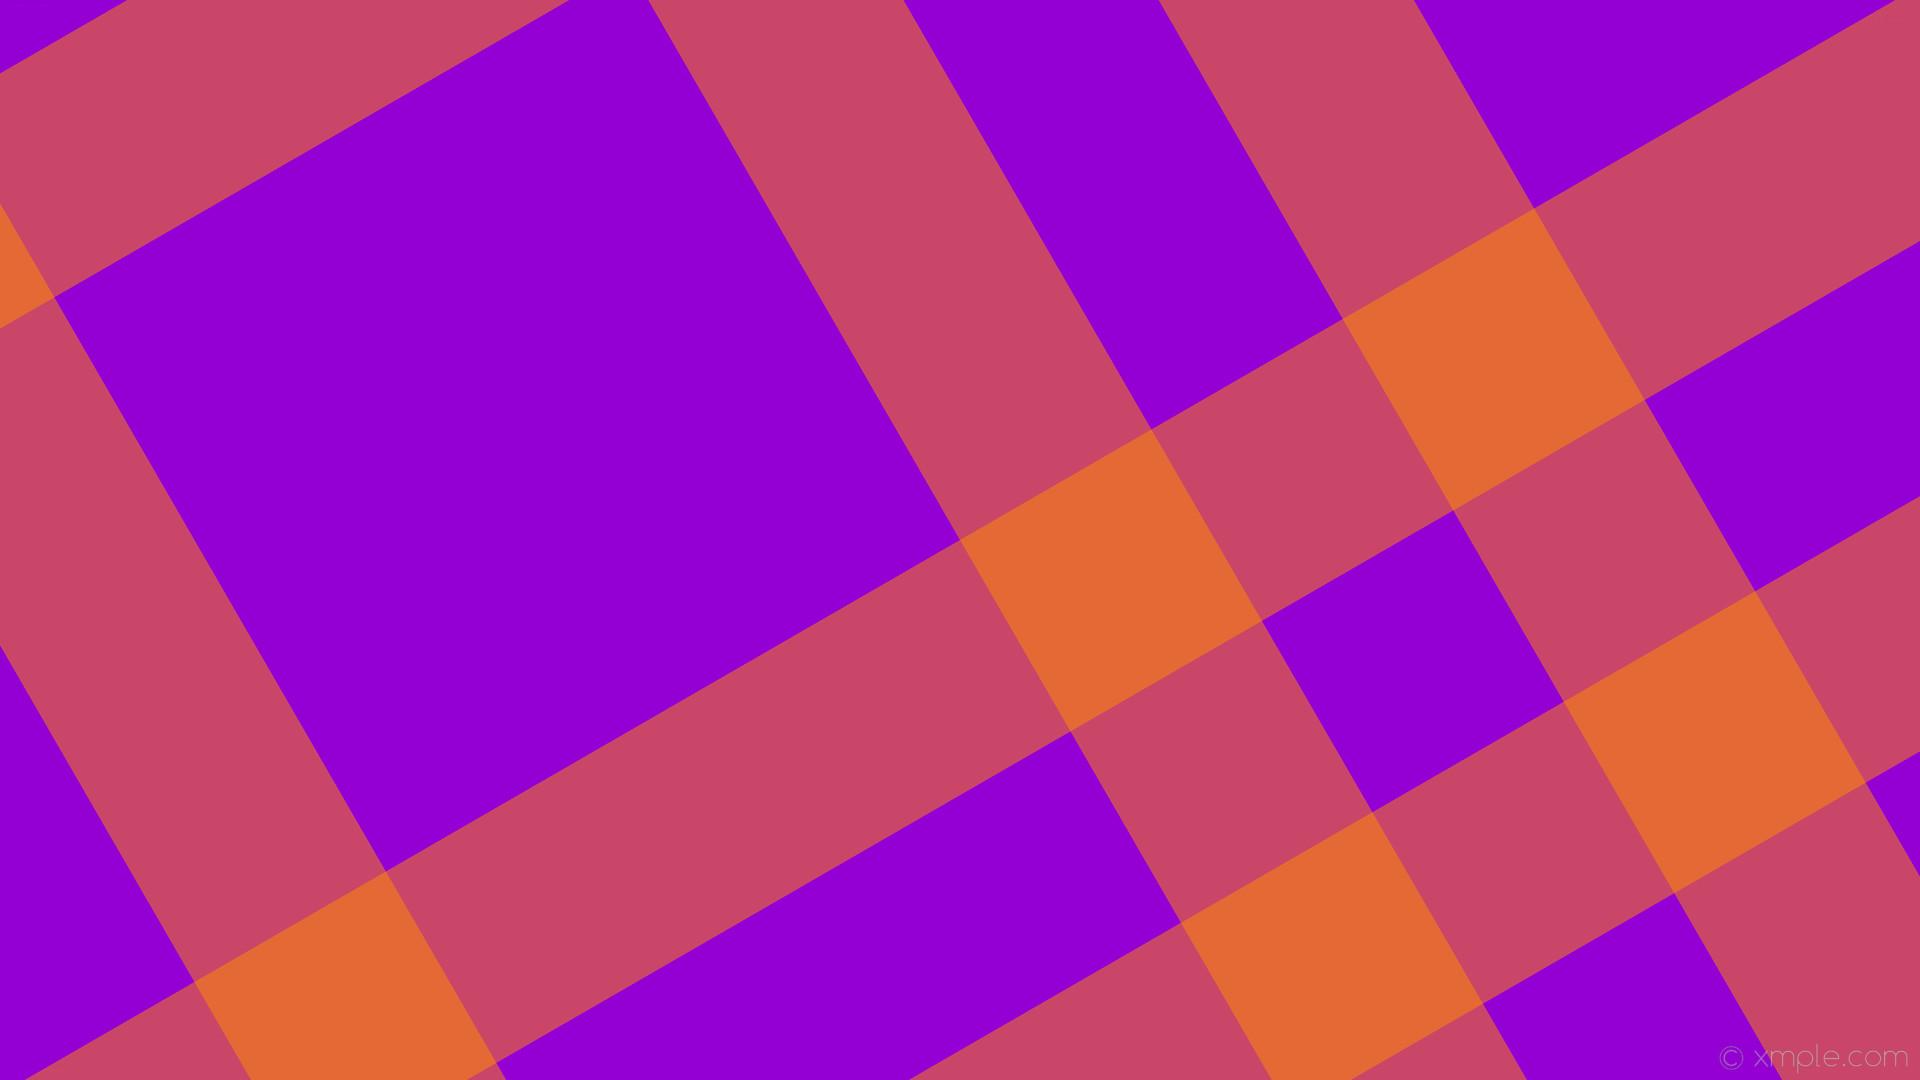 wallpaper dual purple orange gingham striped dark violet dark orange  #9400d3 #ff8c00 30°